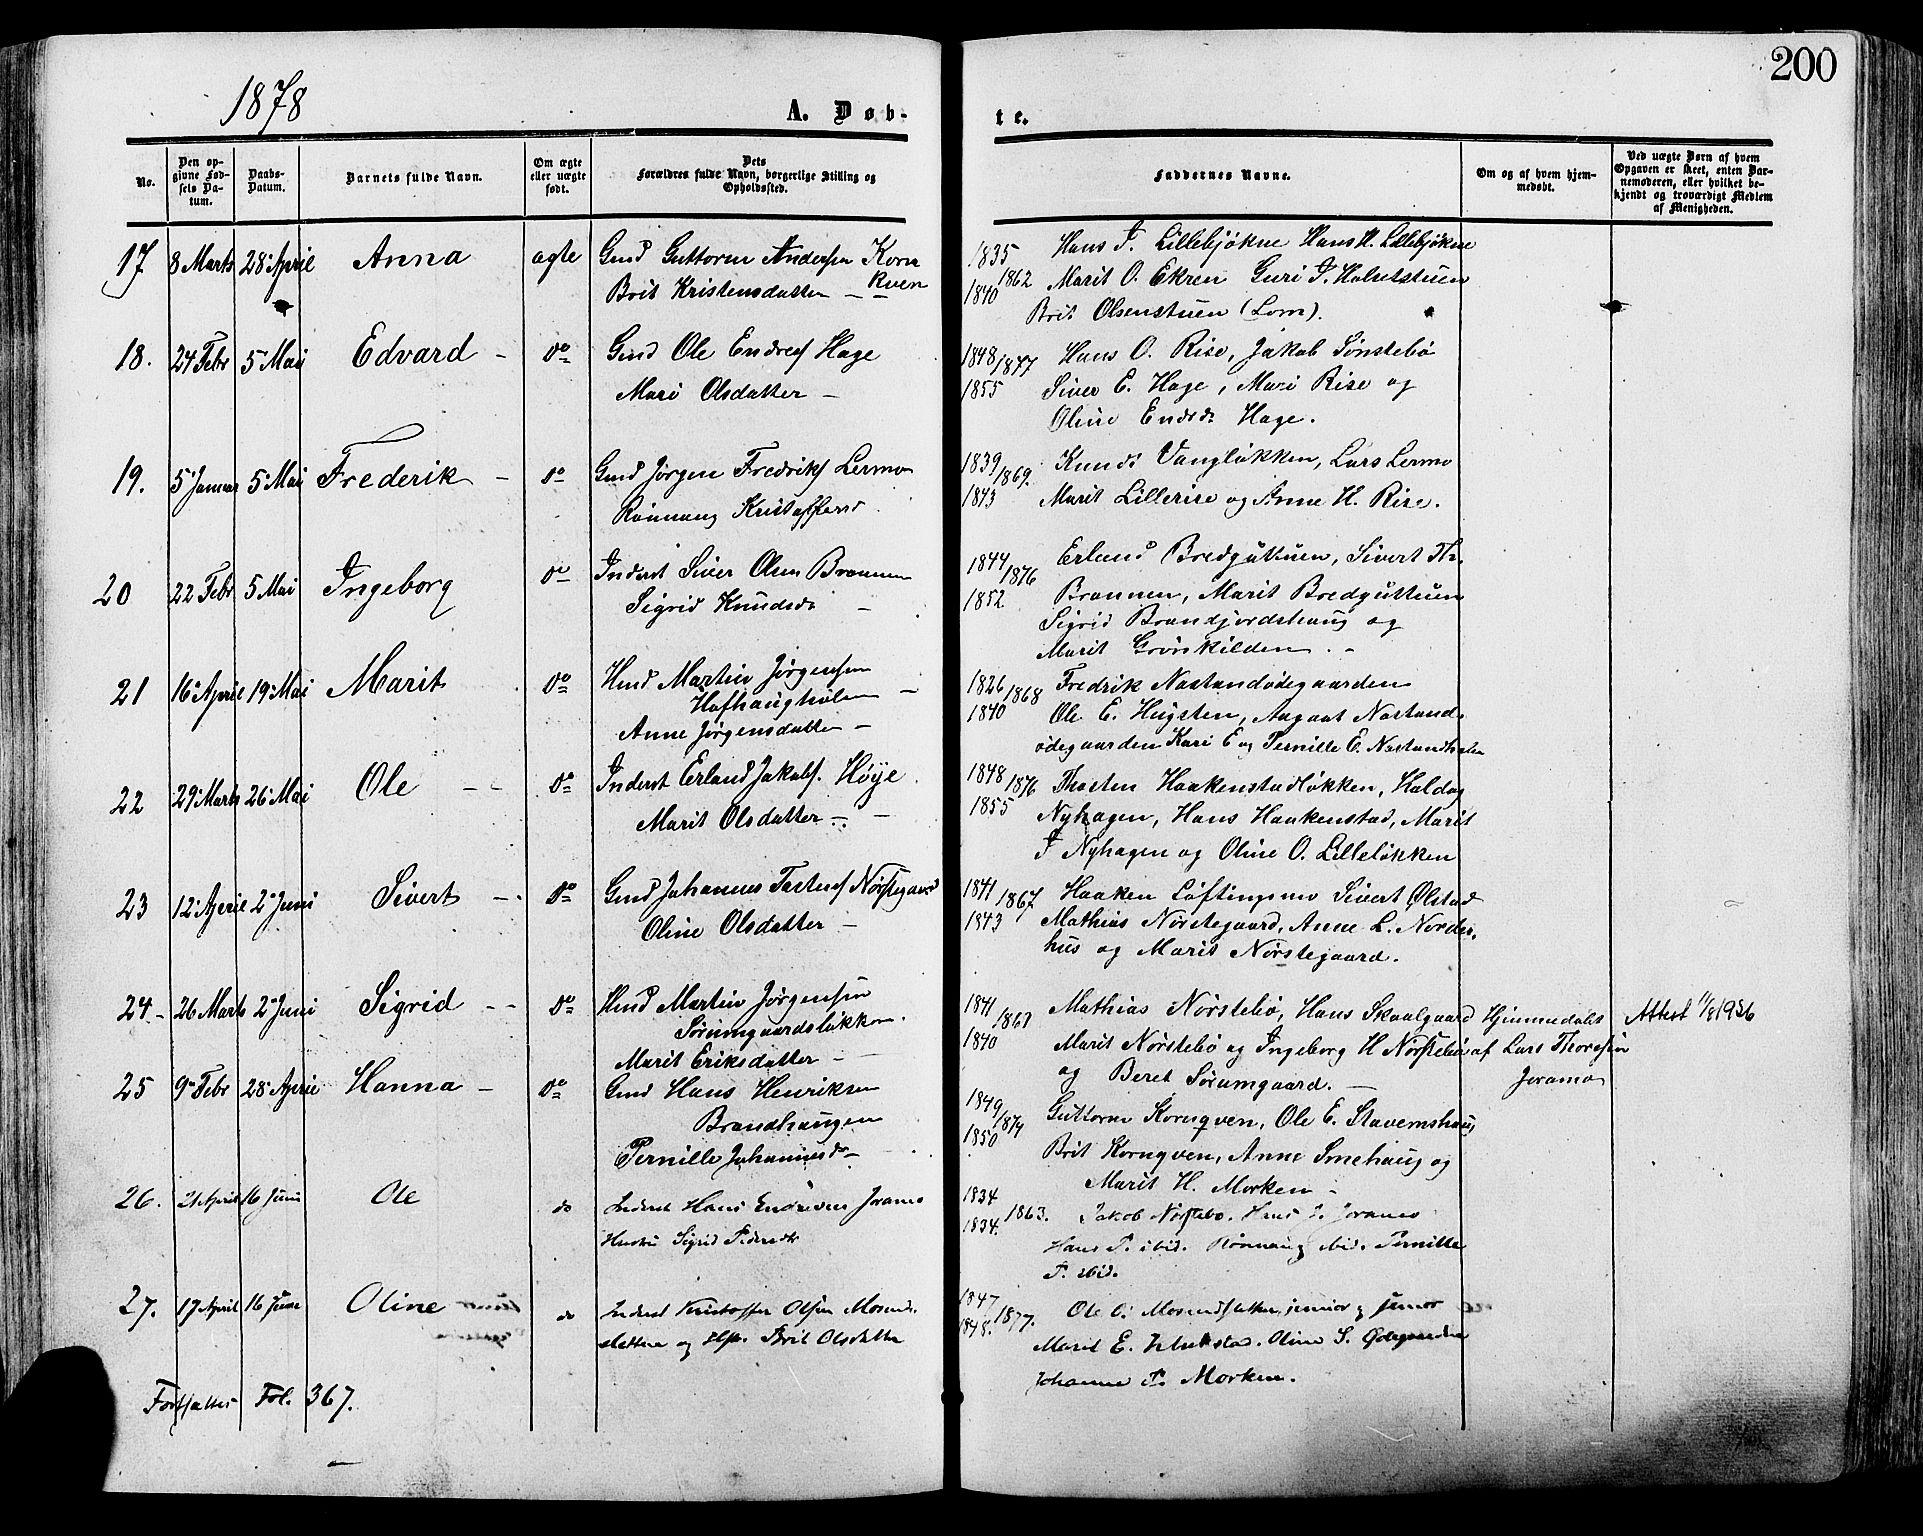 SAH, Lesja prestekontor, Ministerialbok nr. 8, 1854-1880, s. 200